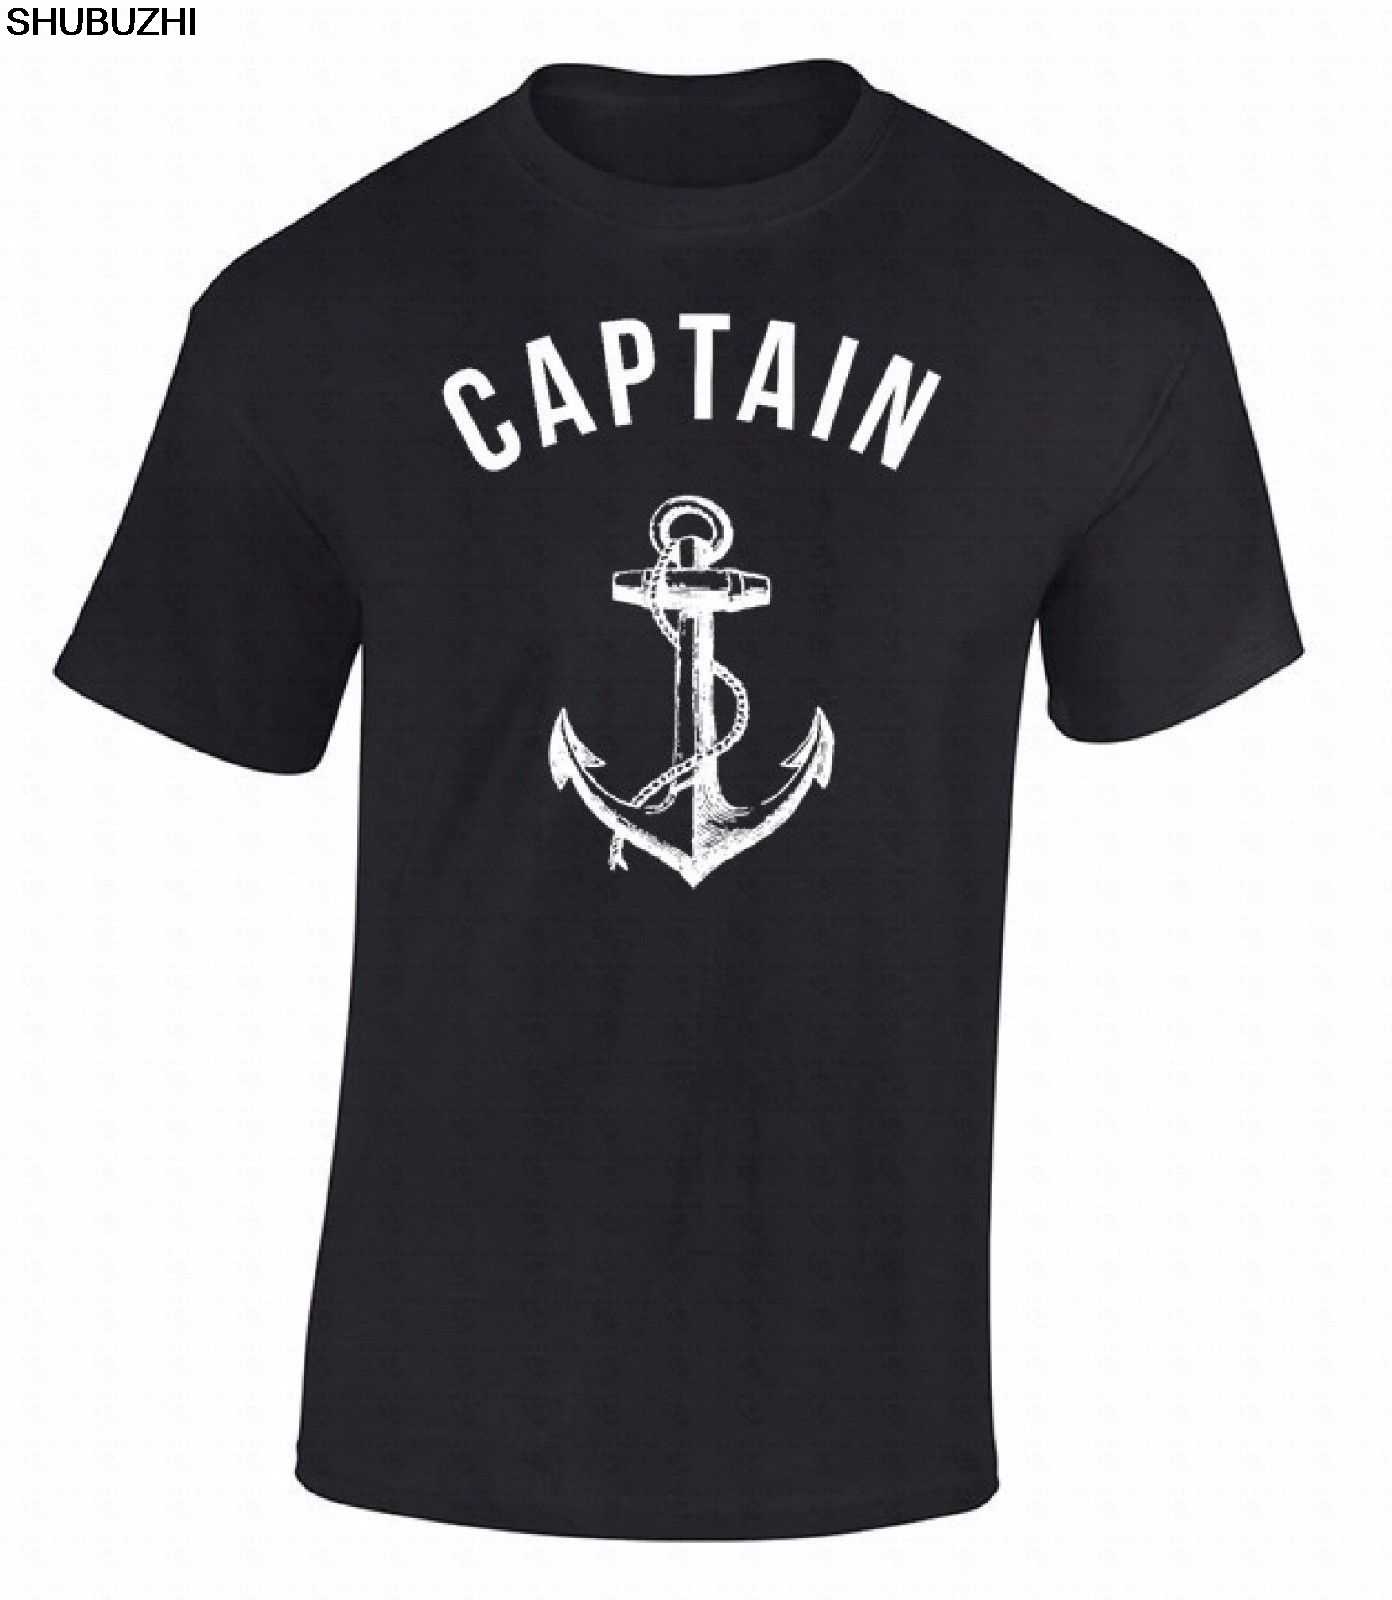 High Quality T-shirt Captain T-shirt Anchor Nautical Sea Sailor Ship Marine Fashion Cool Gift Shirt sbz6240